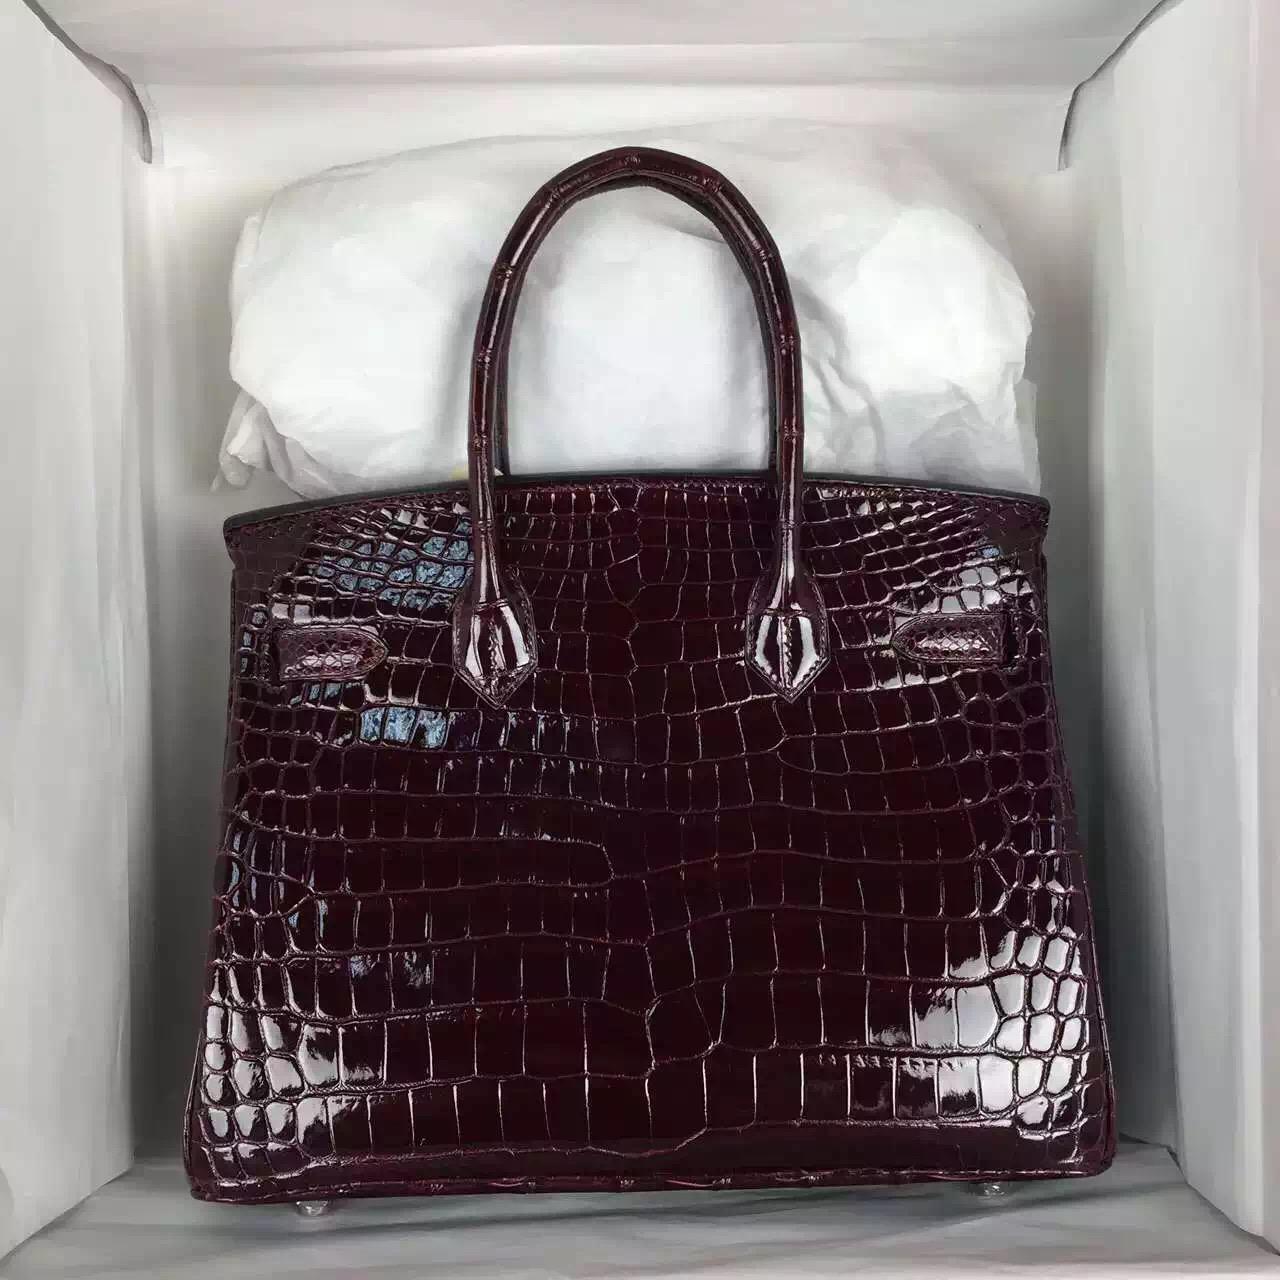 Hand Stitching Hermes CK57 Bordeaux Red HCP Crocodile Shiny Leather Birkin Bag30cm